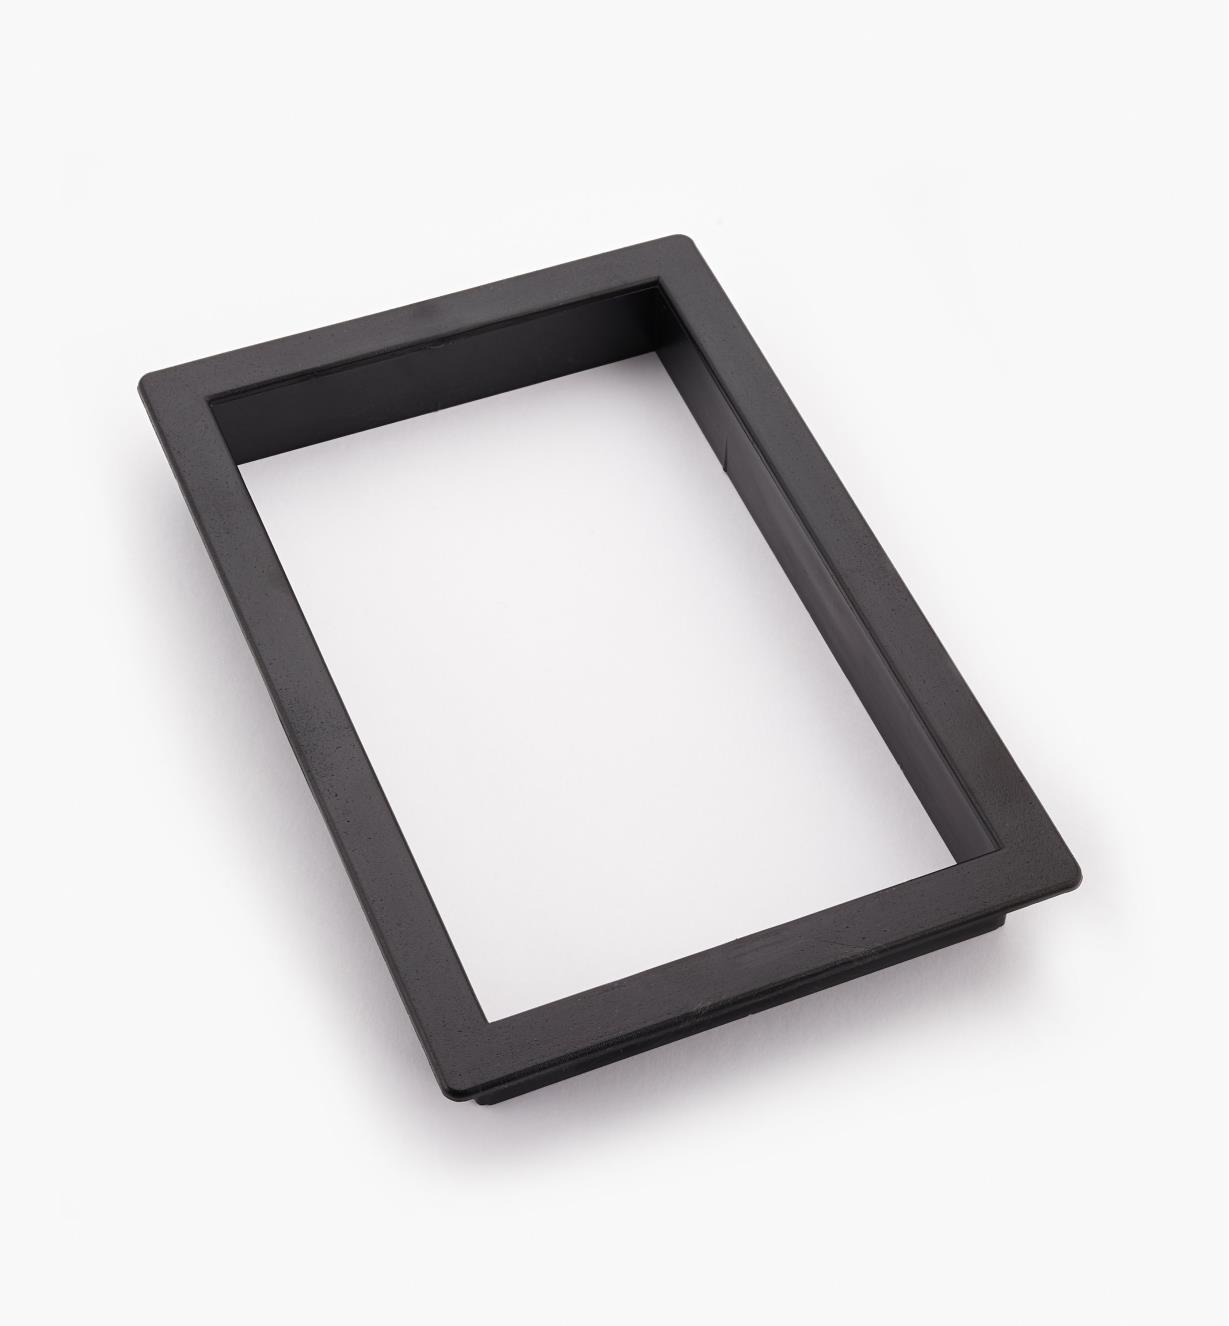 00U0991 - Black Grommet